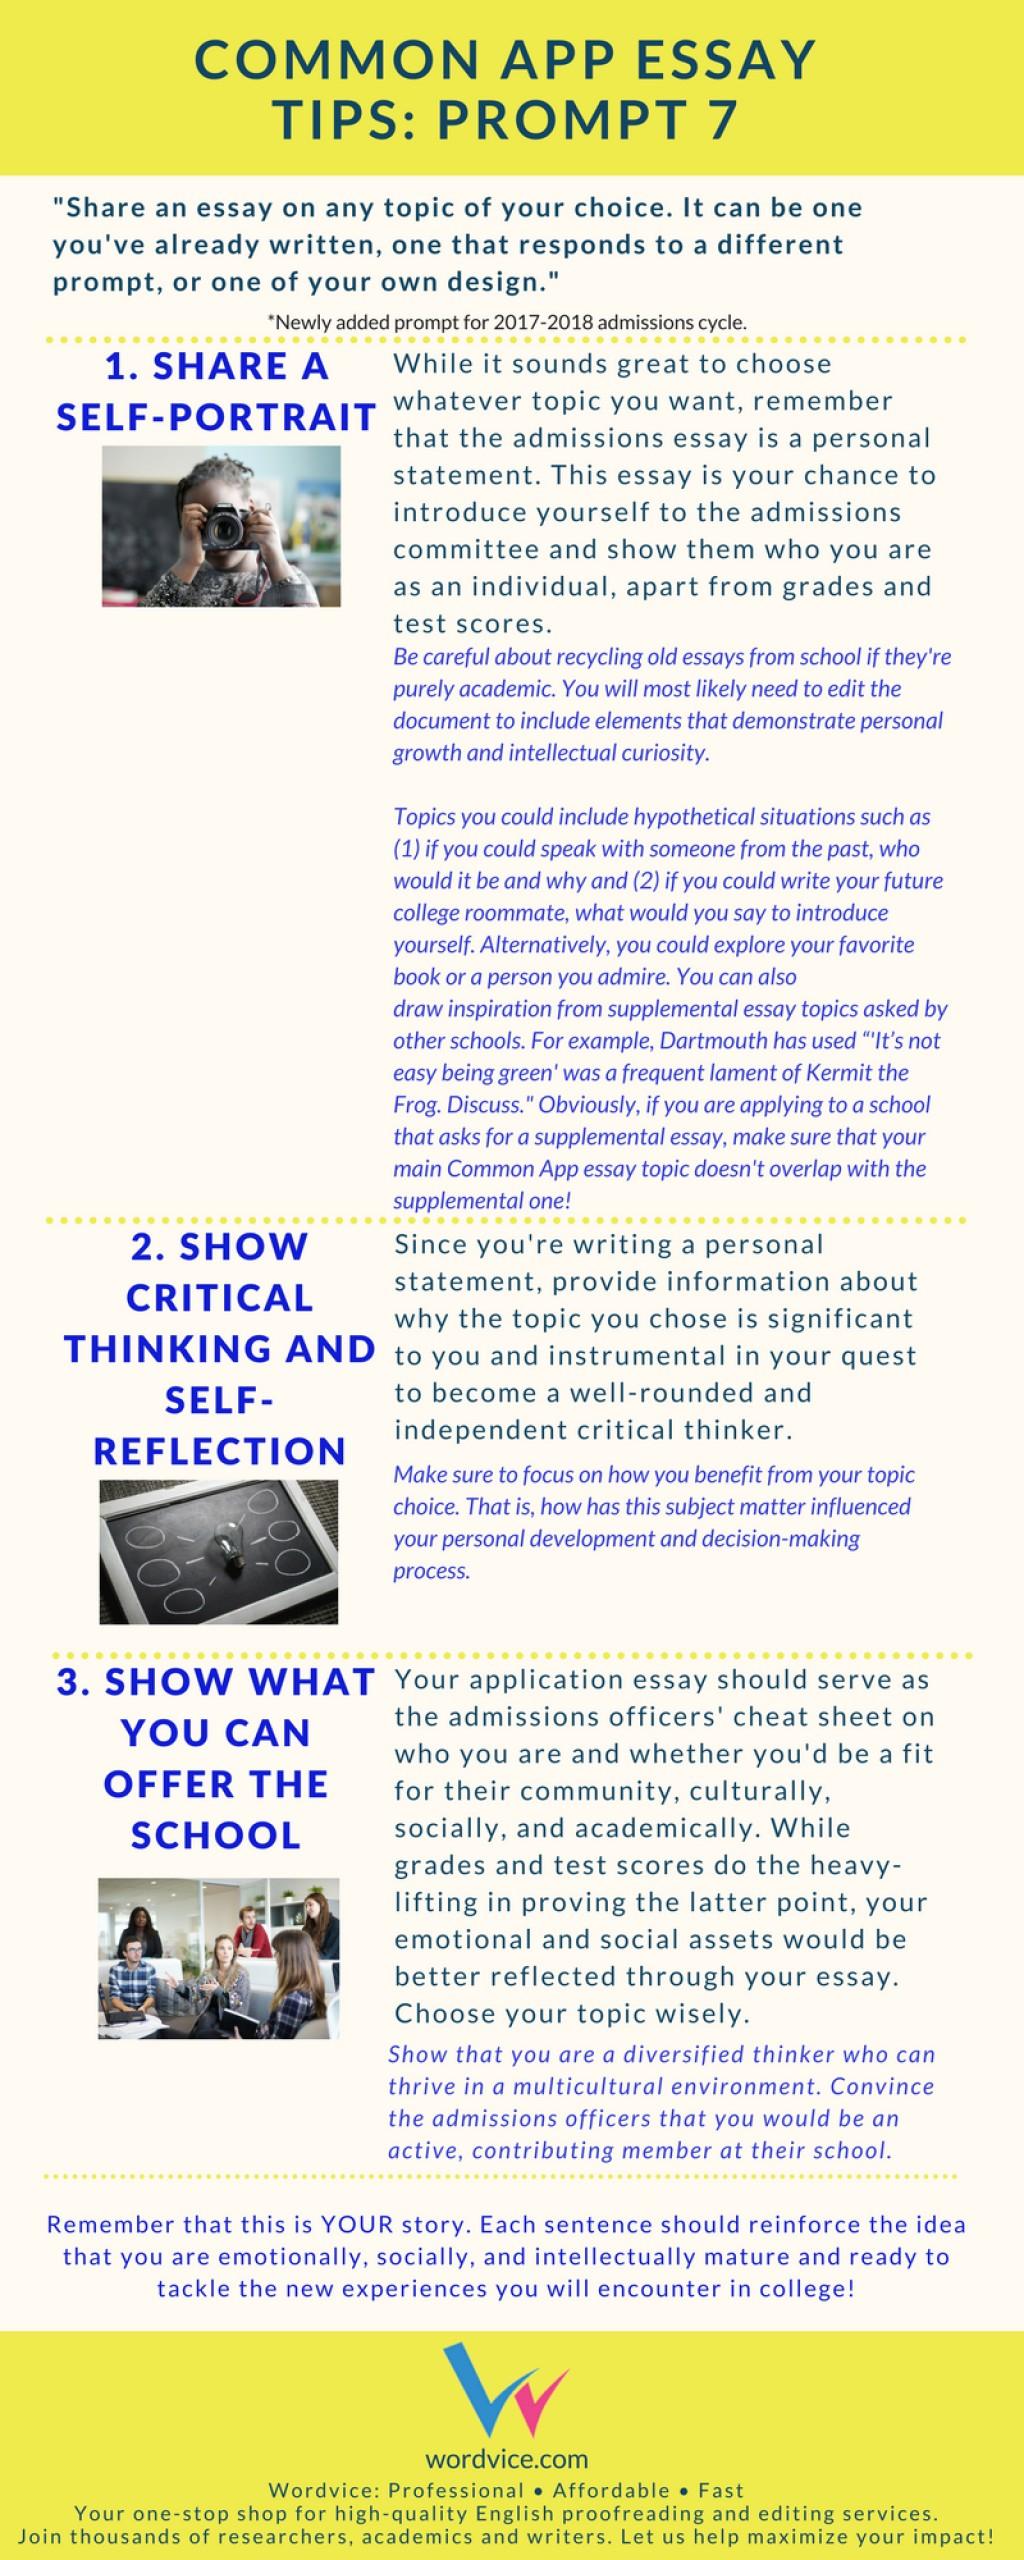 011 Common App Brainstormprompt Essay Questions Dreaded 2017 2017-18 Large